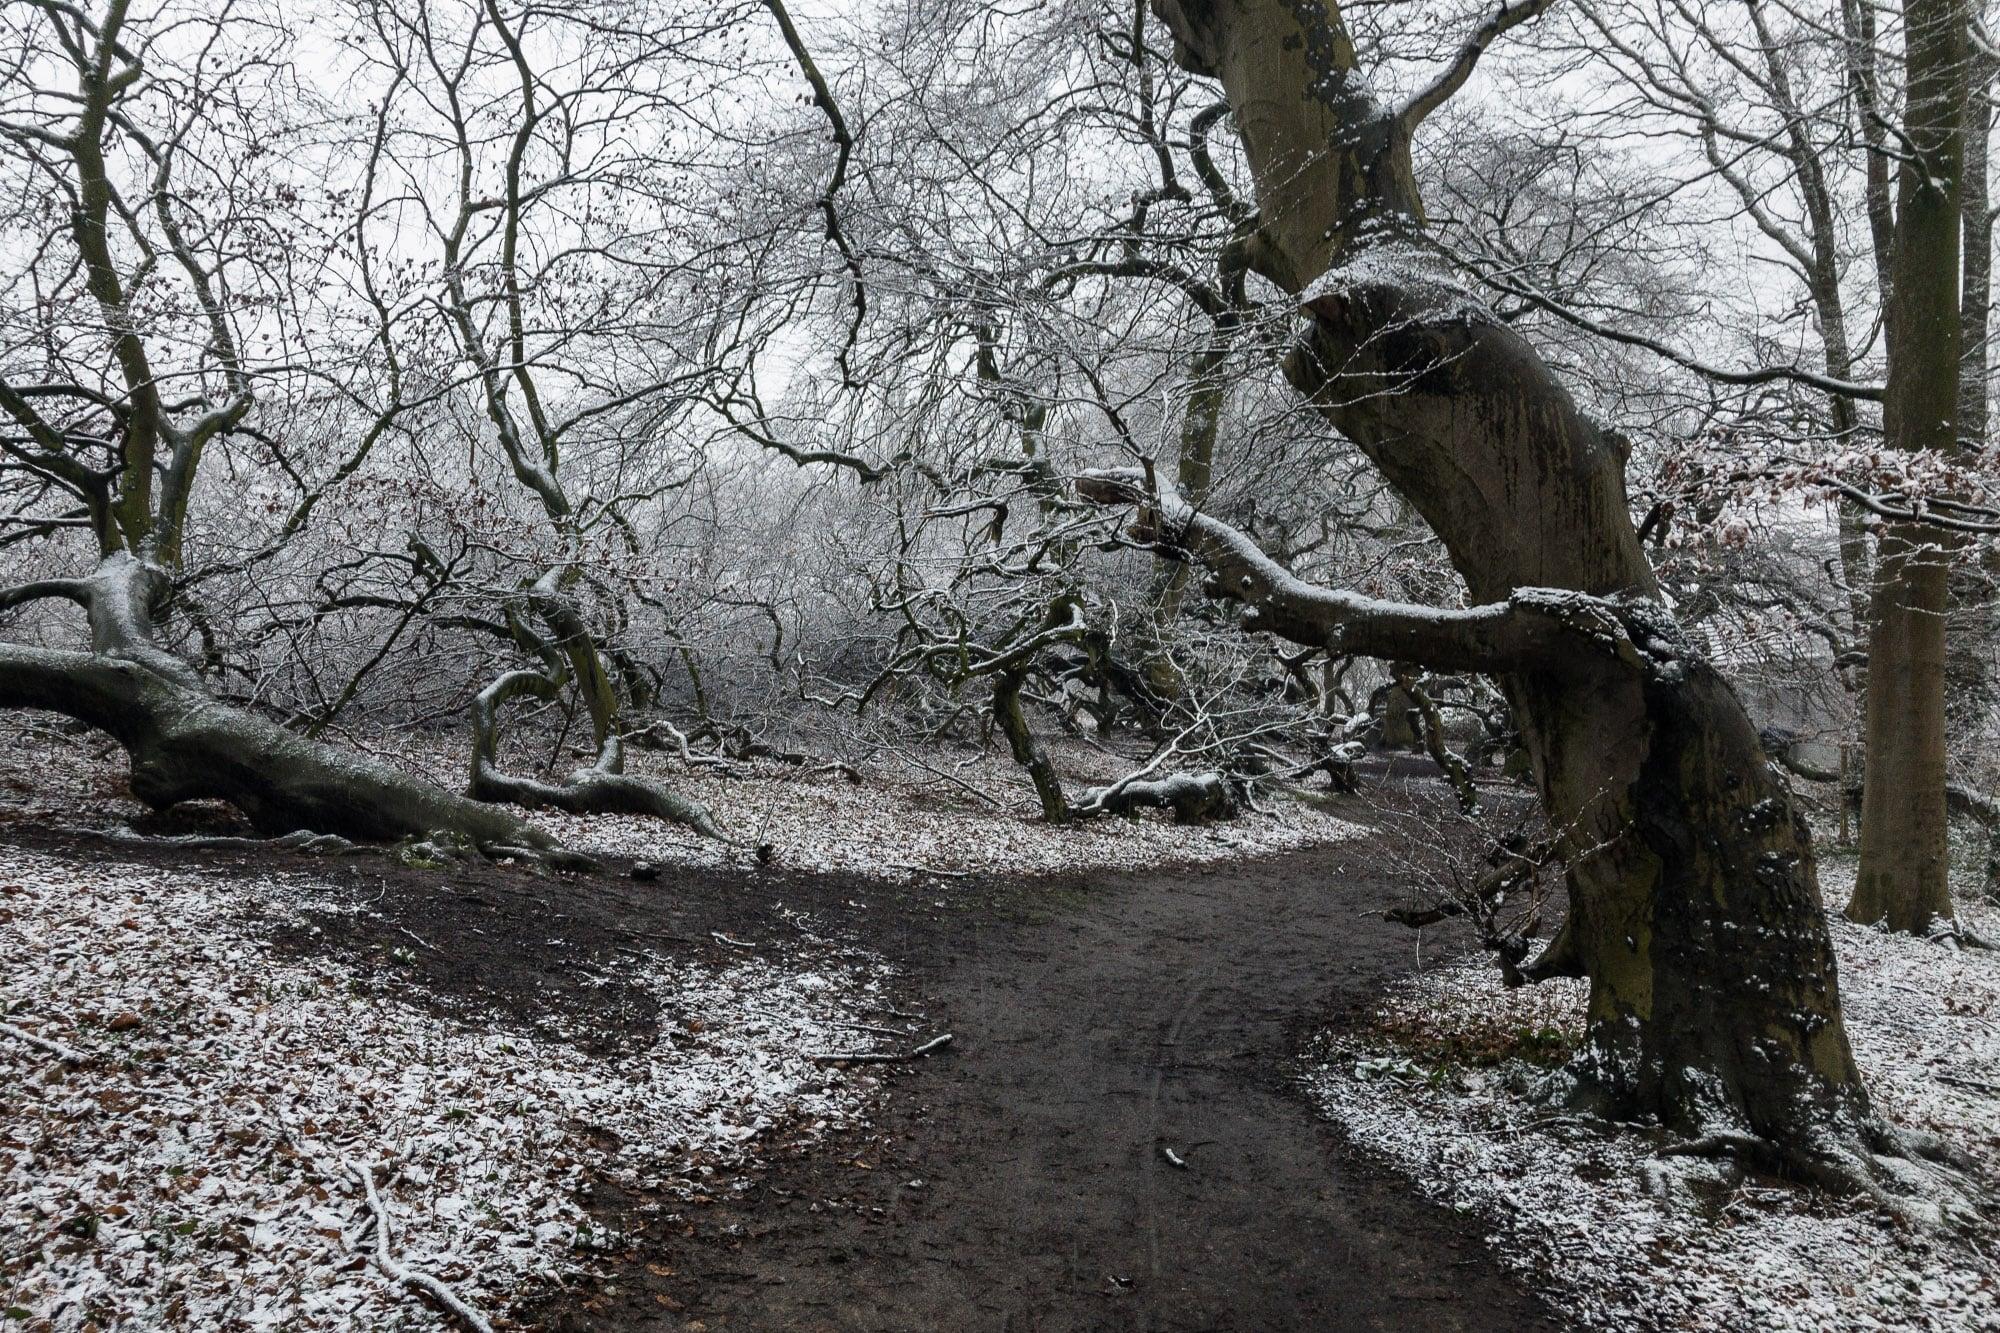 snowy dwarf beeches